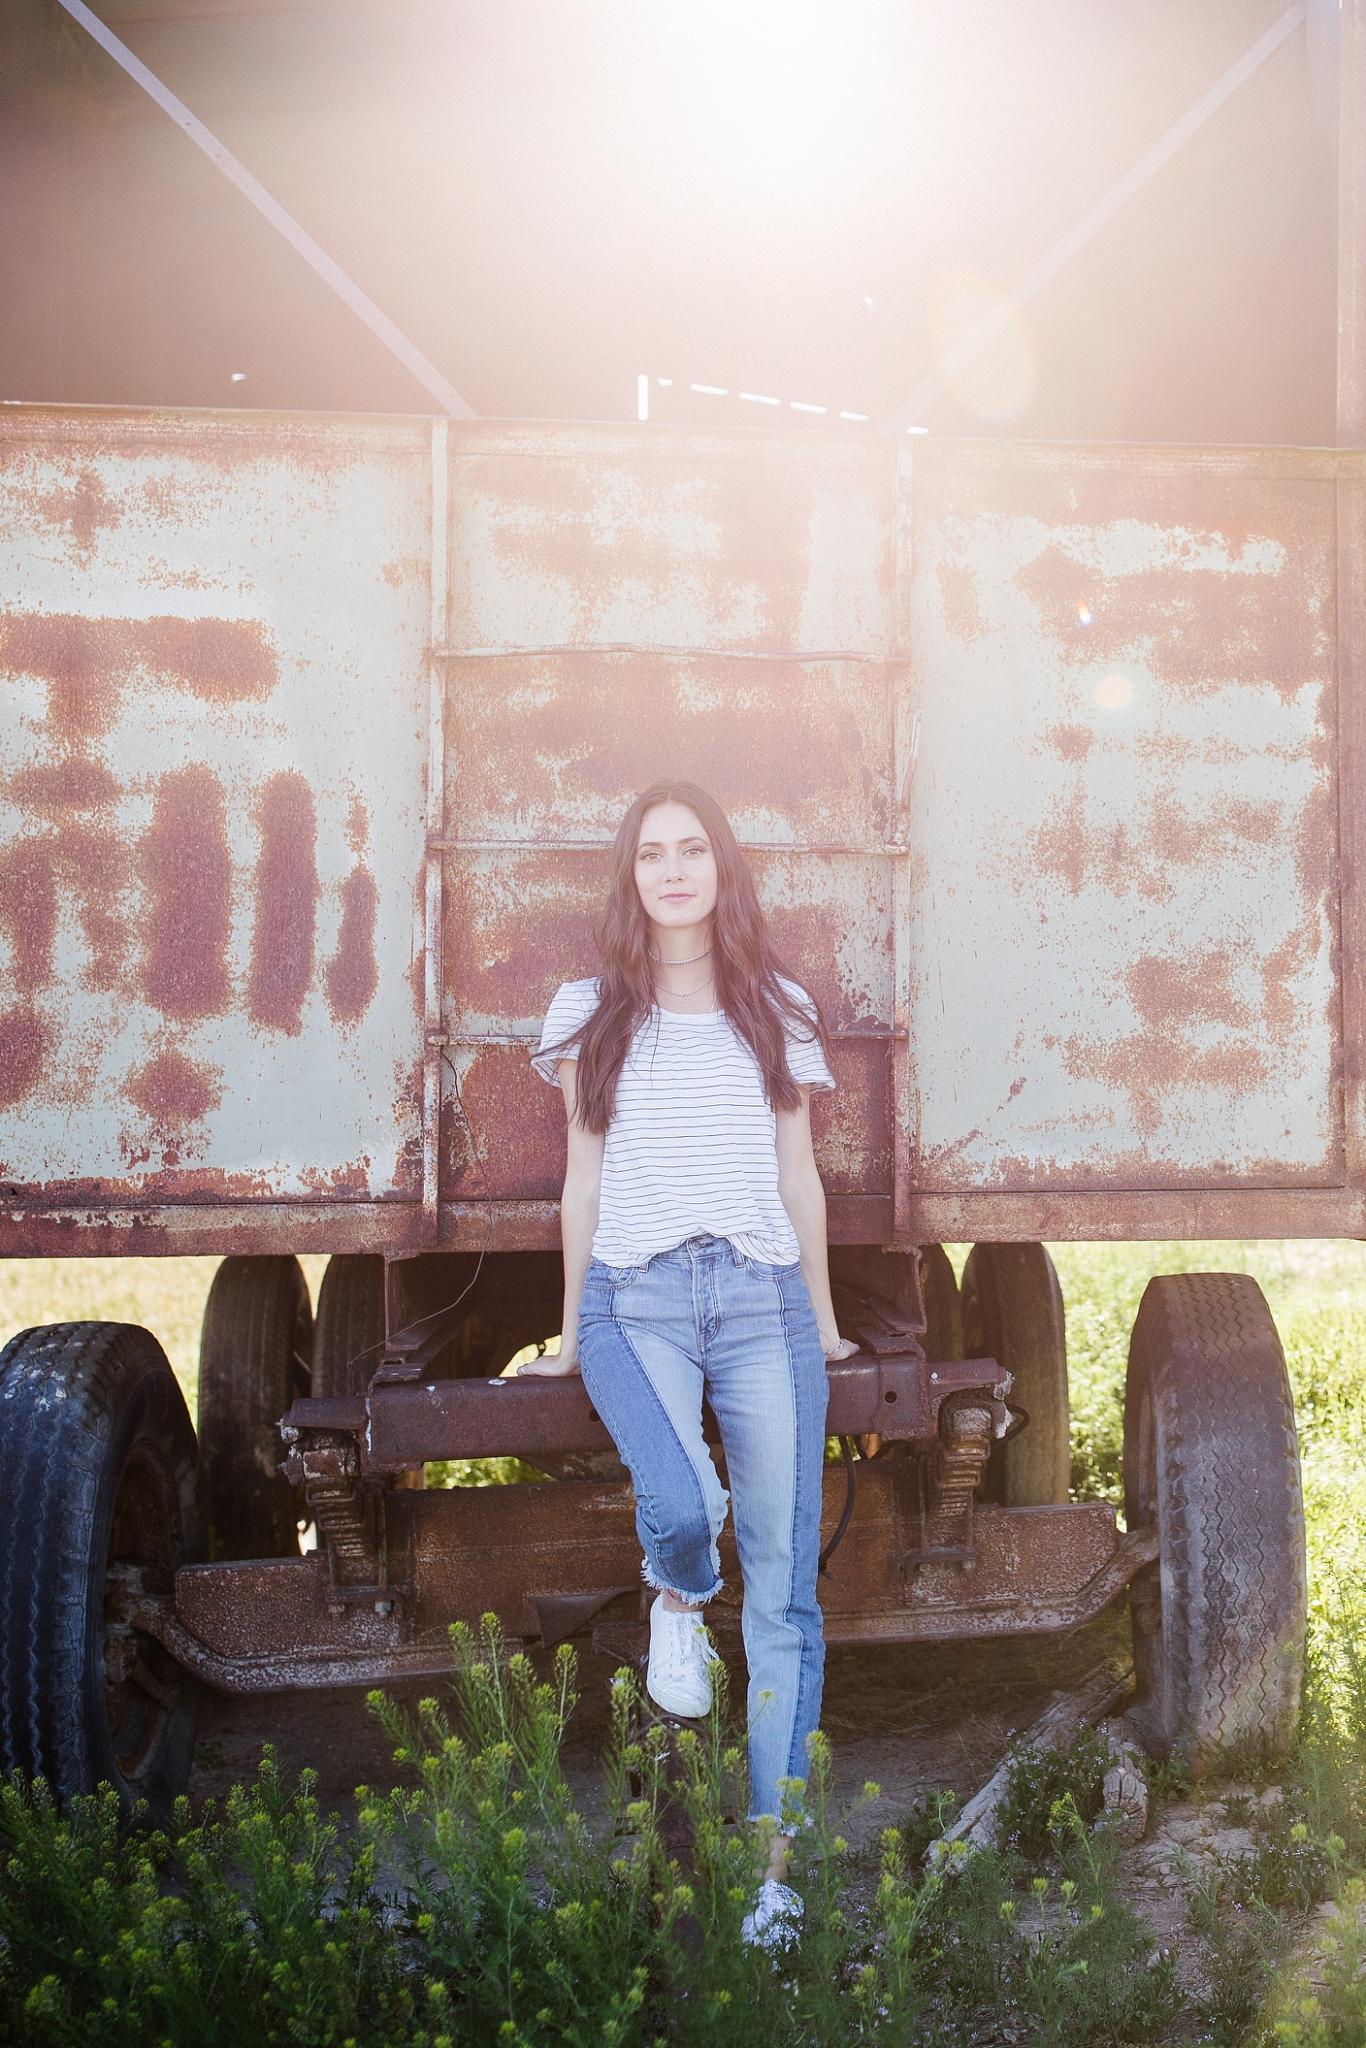 Audrey-9_Lizzie-B-Imagery-Utah-Family-Photographer-Central-Utah-Senior-Photography.jpg